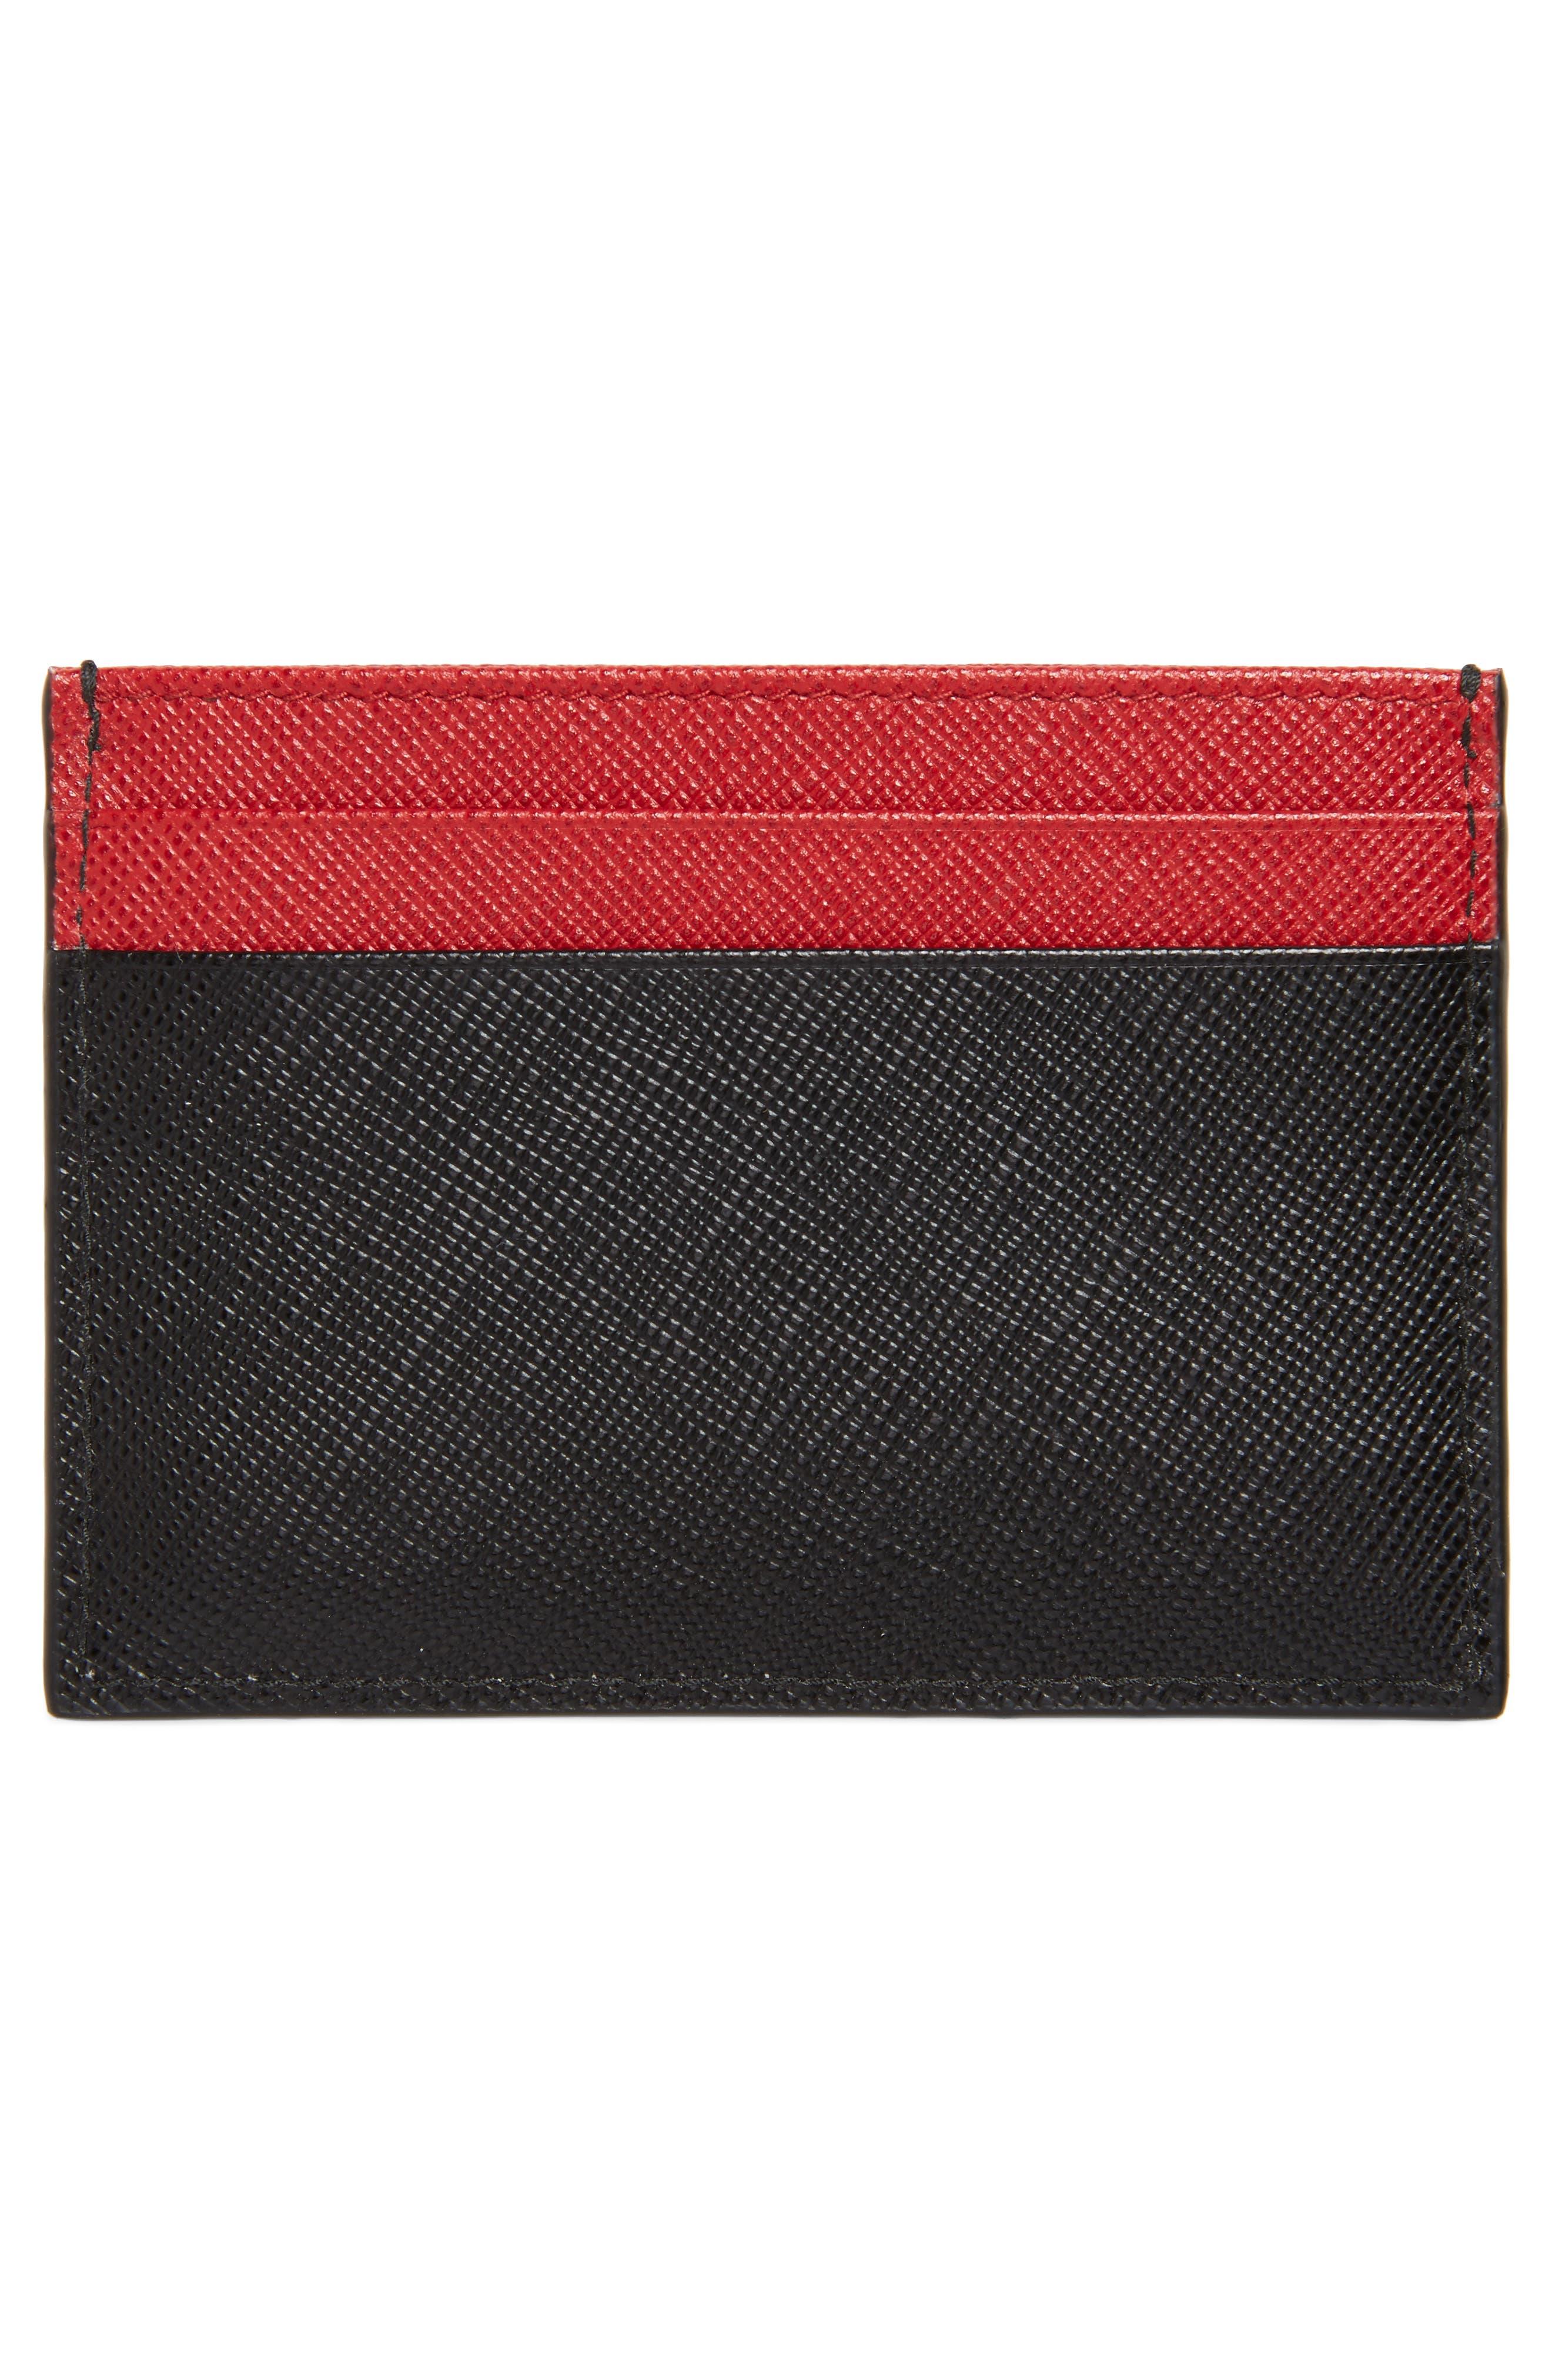 Bicolor Saffiano Leather Card Case,                             Alternate thumbnail 2, color,                             BLACK/ RED